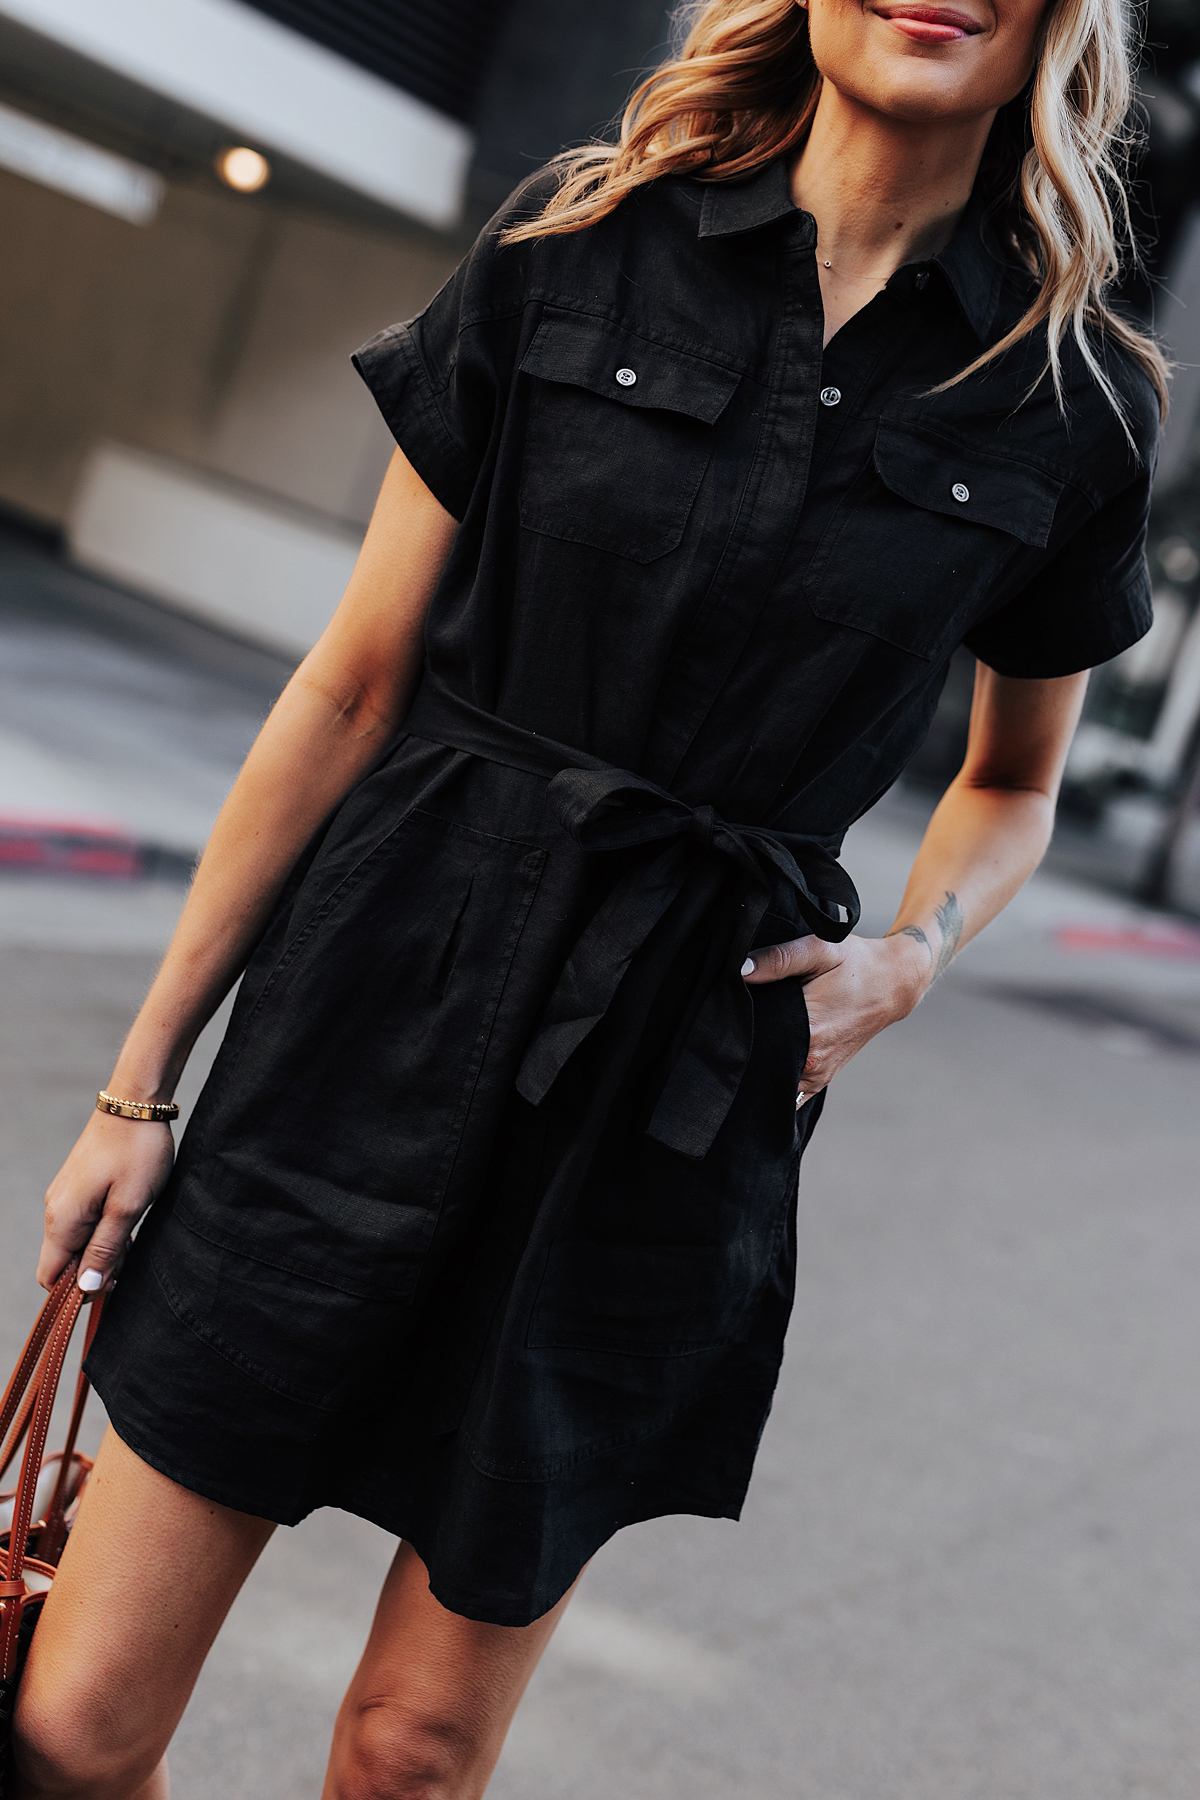 Blonde Woman Wearing Black Short Sleeve Shirt Dress Fashion Jackson San Diego Fashion Blogger Street Style